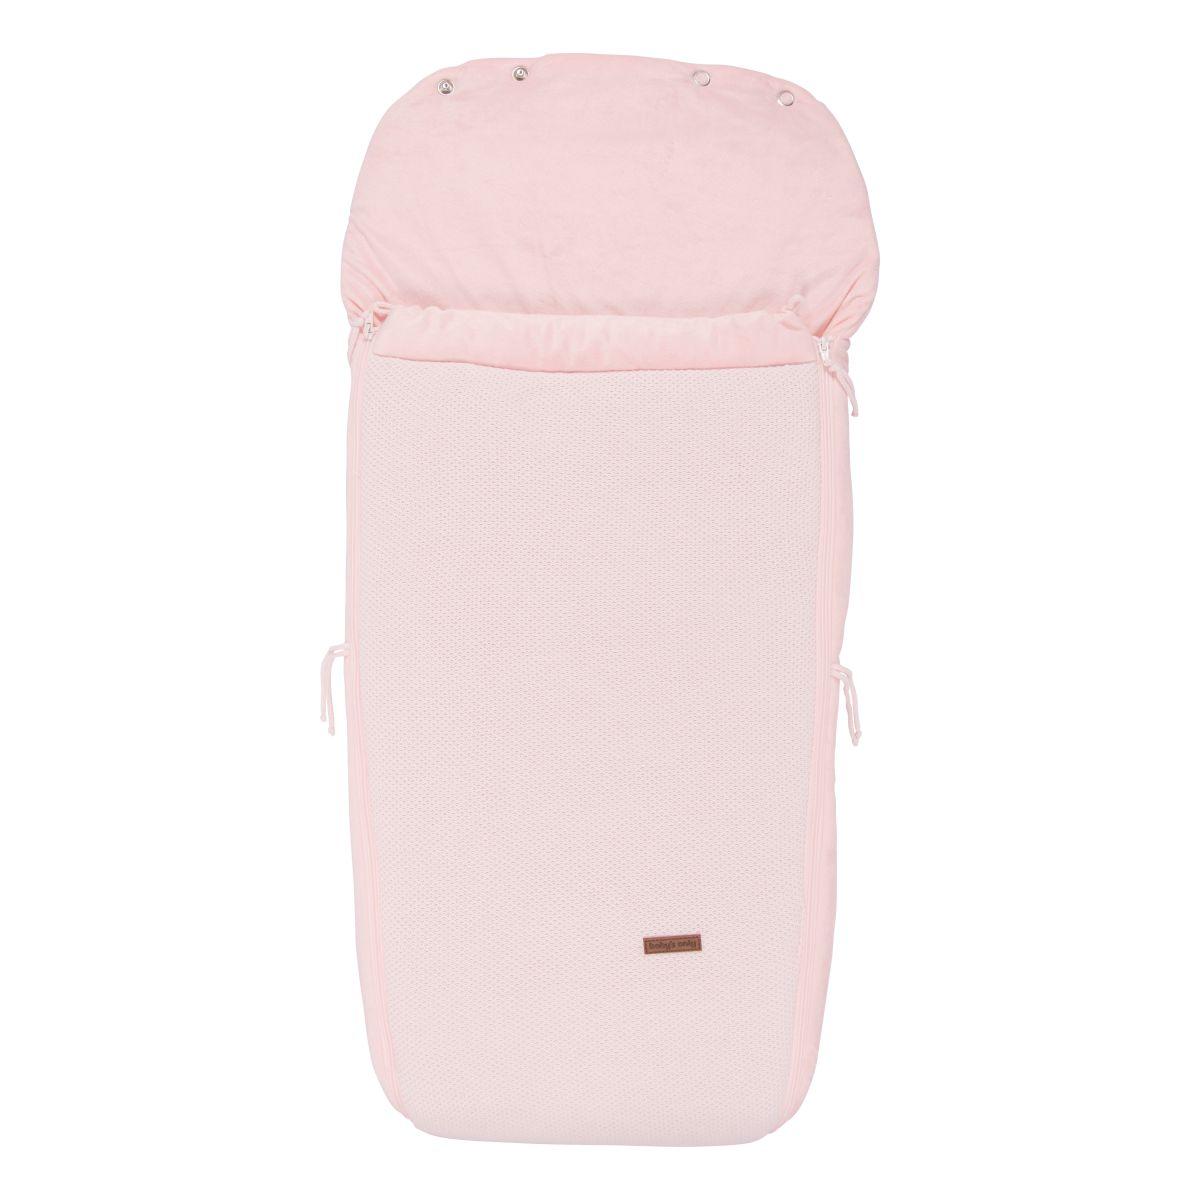 footmuff buggy classic pink